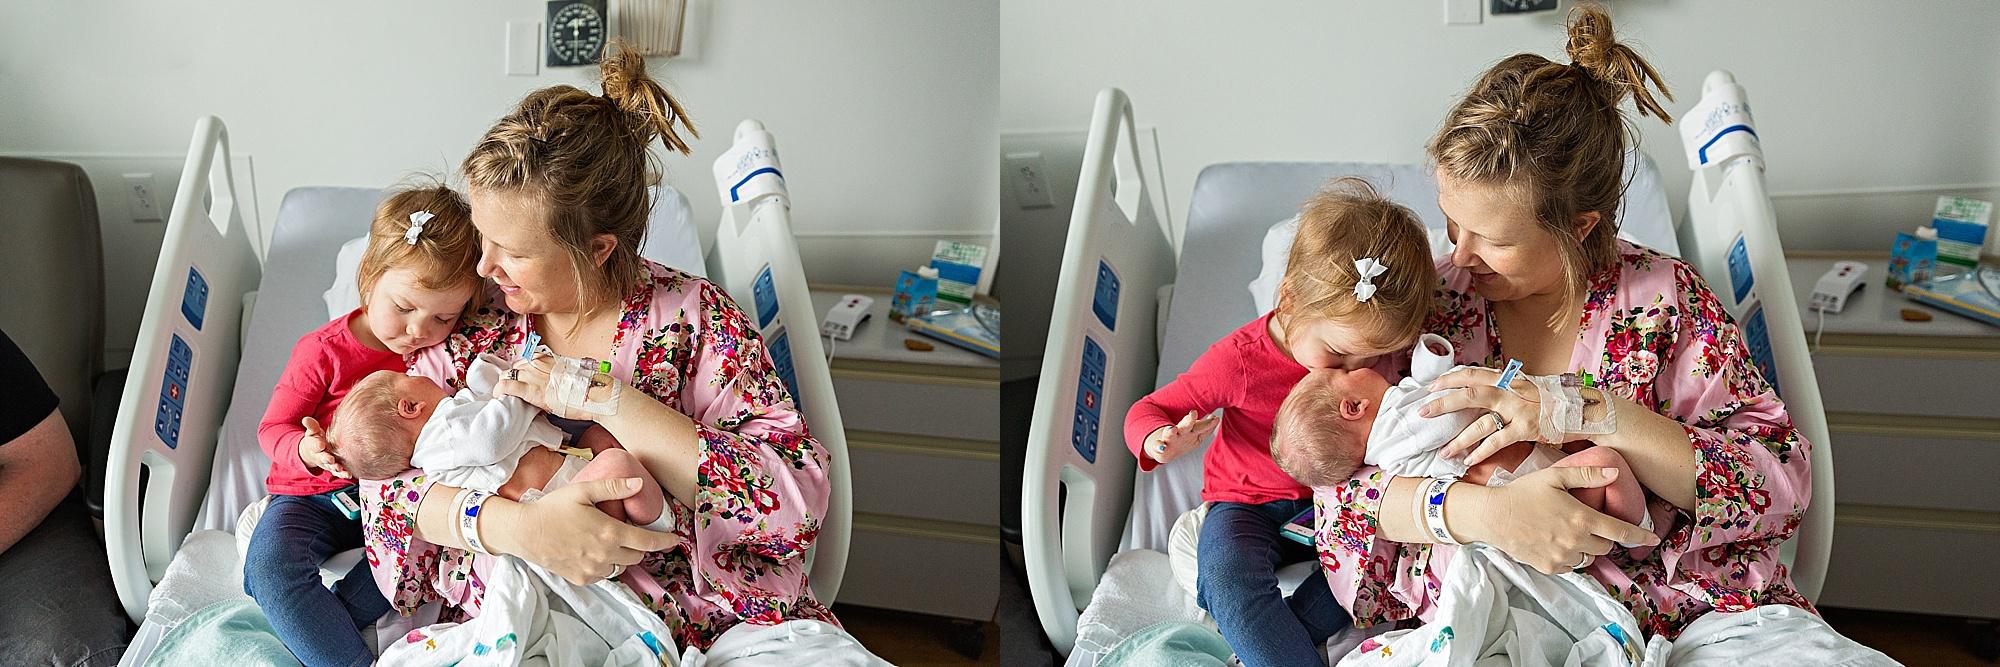 lauren-grayson-photography-akron-ohio-photographer-family-newborn-fresh-48-baby-hospital-photo-shoot-cleveland-clinic-akron-general-carter_0326.jpg